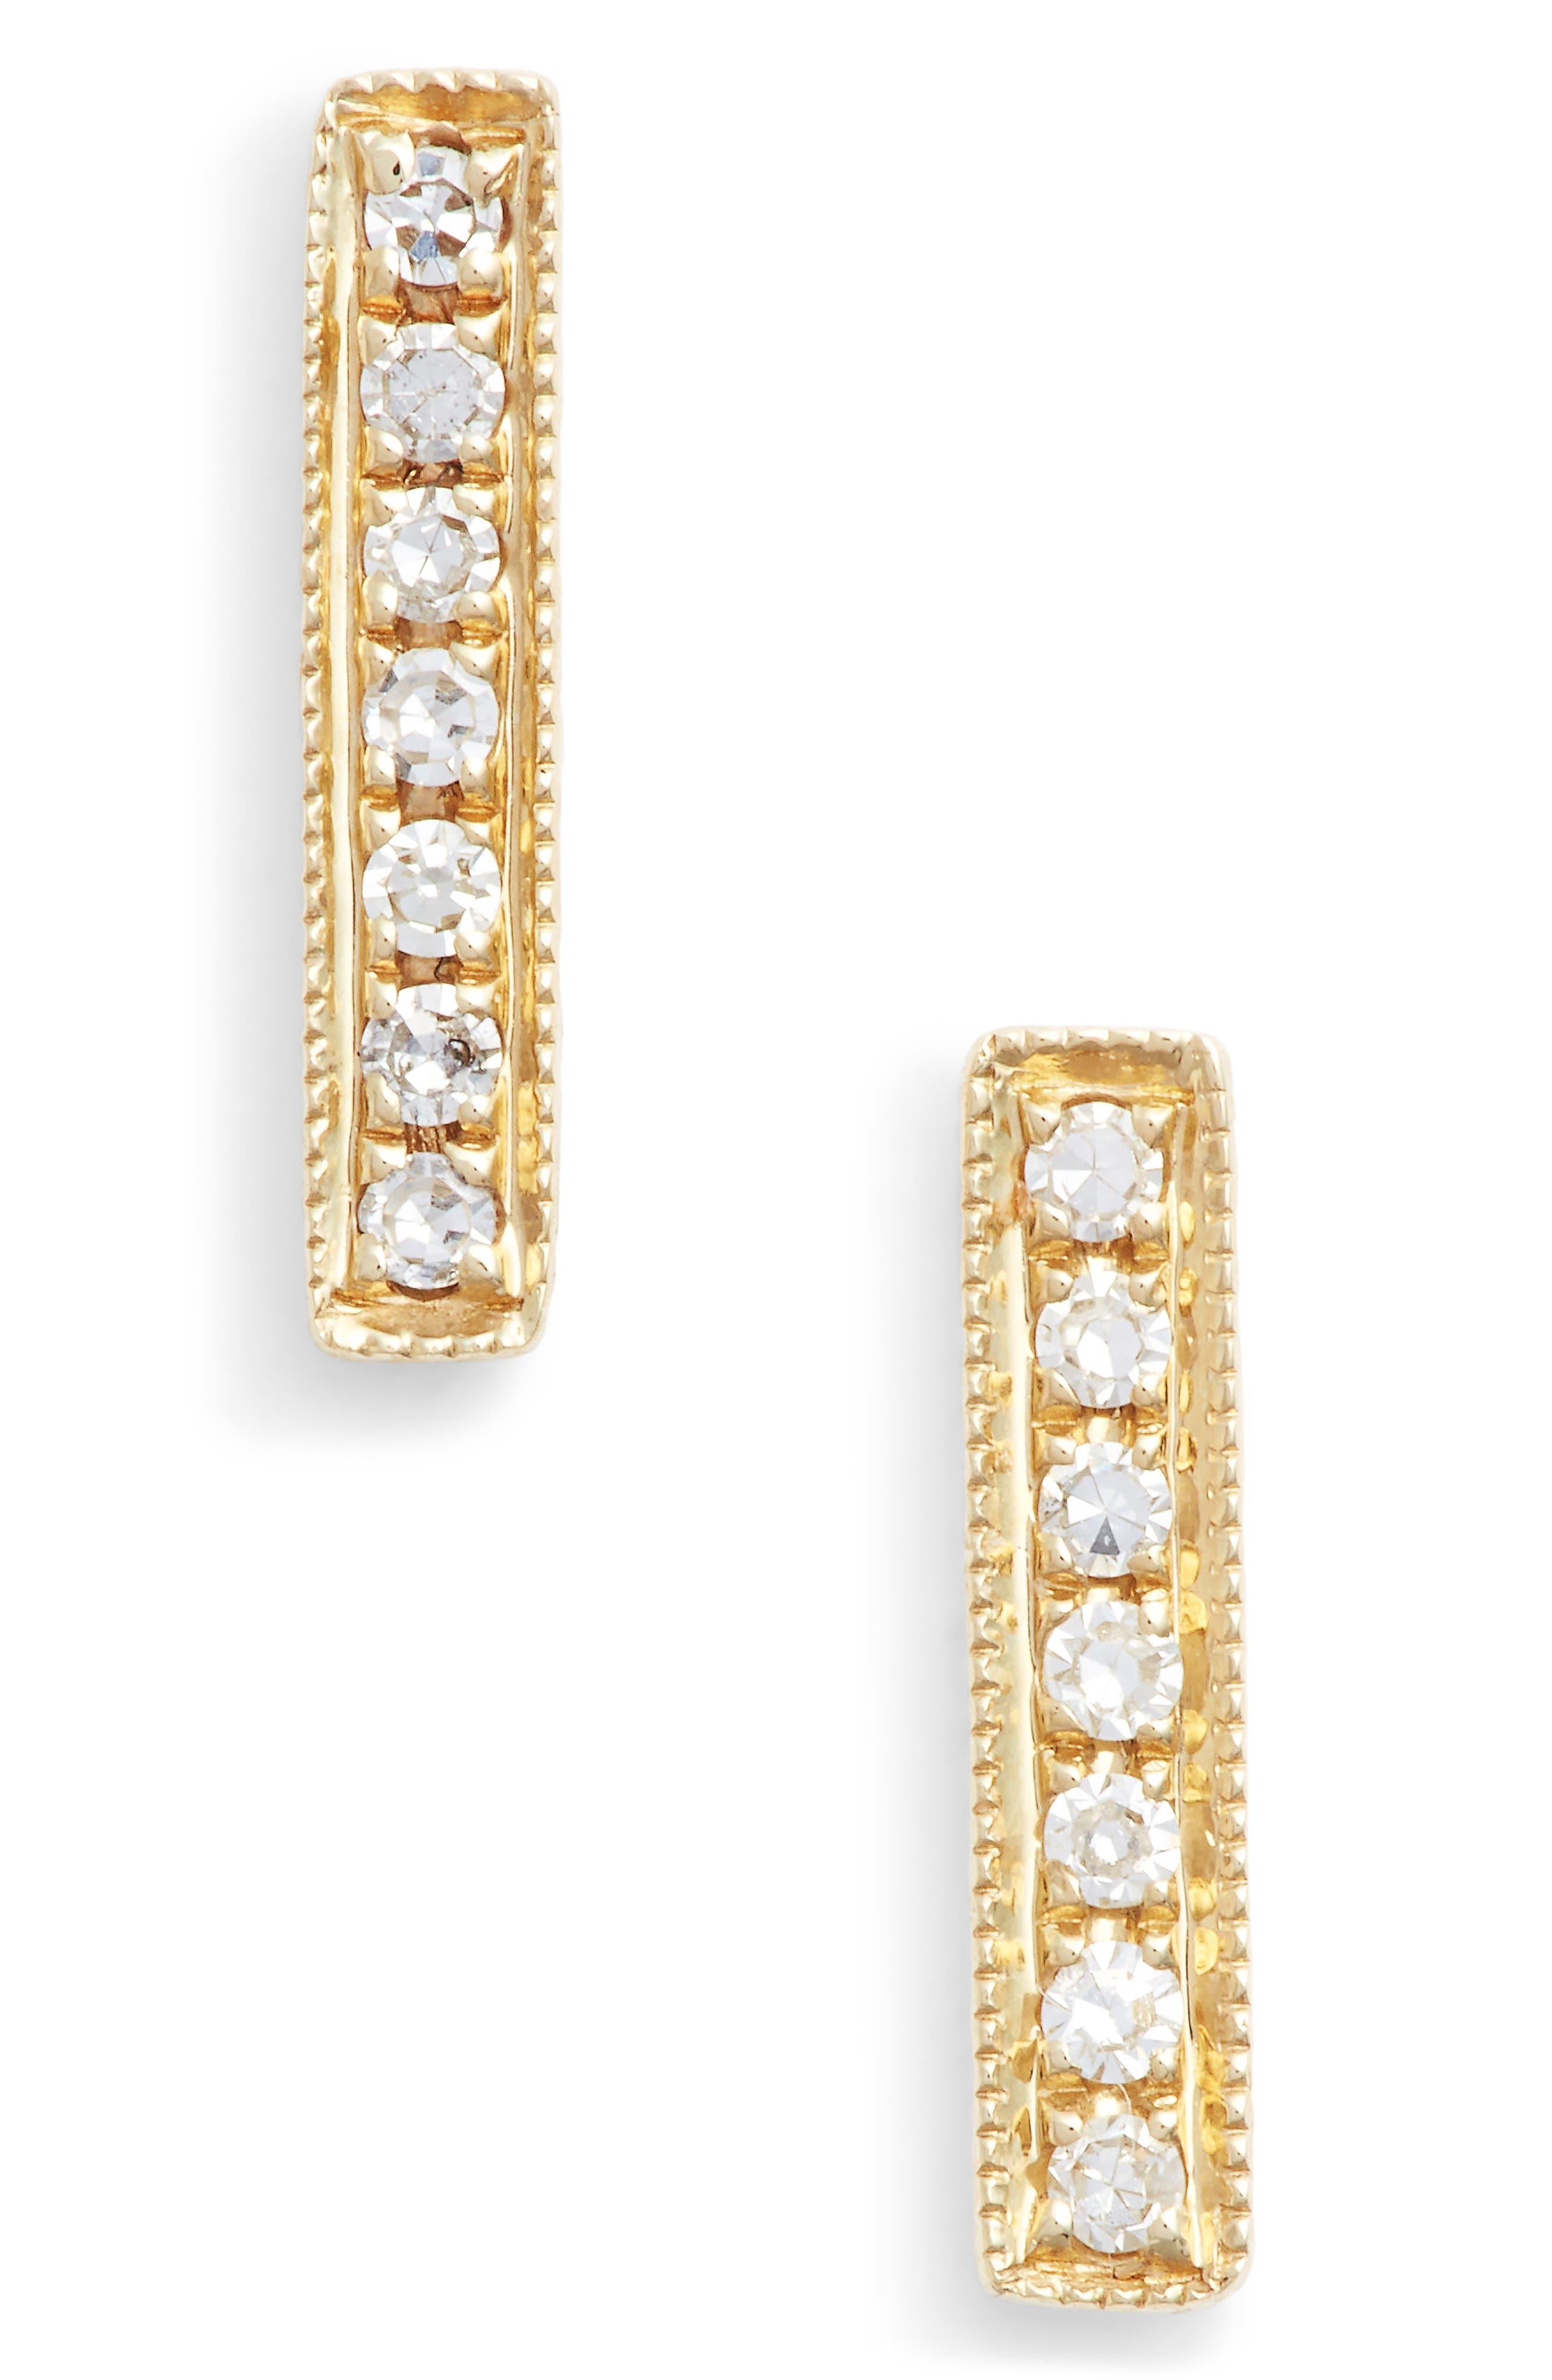 Dana Rebecca Designs 'Sylvie Rose' Diamond Bar Stud Earrings